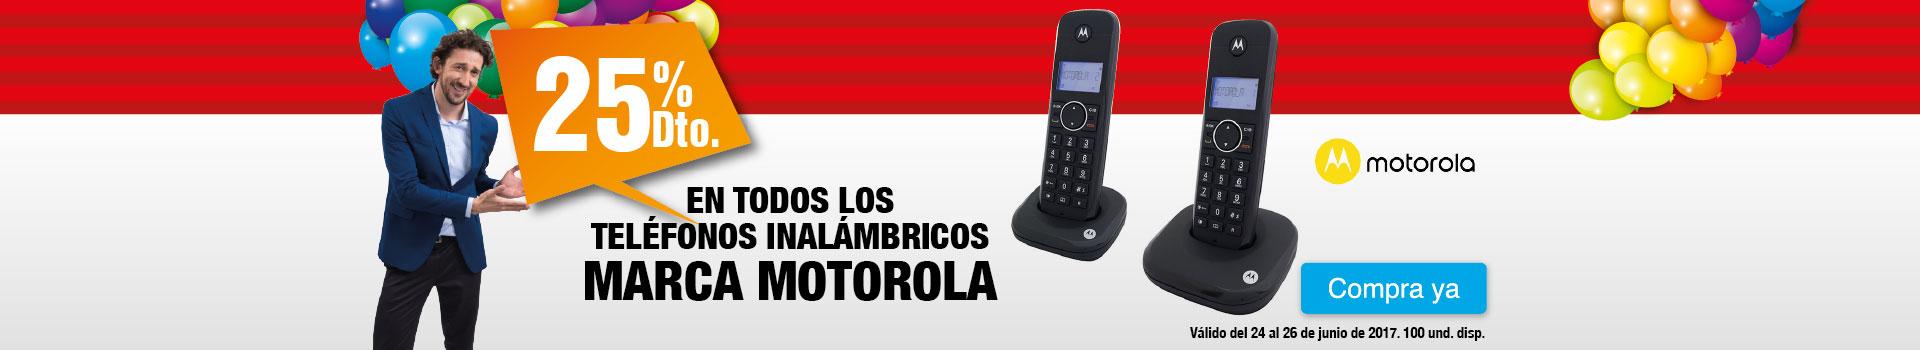 Cat AK - 25 dto en telefonos inalambricos MOTOROLA - Jun24